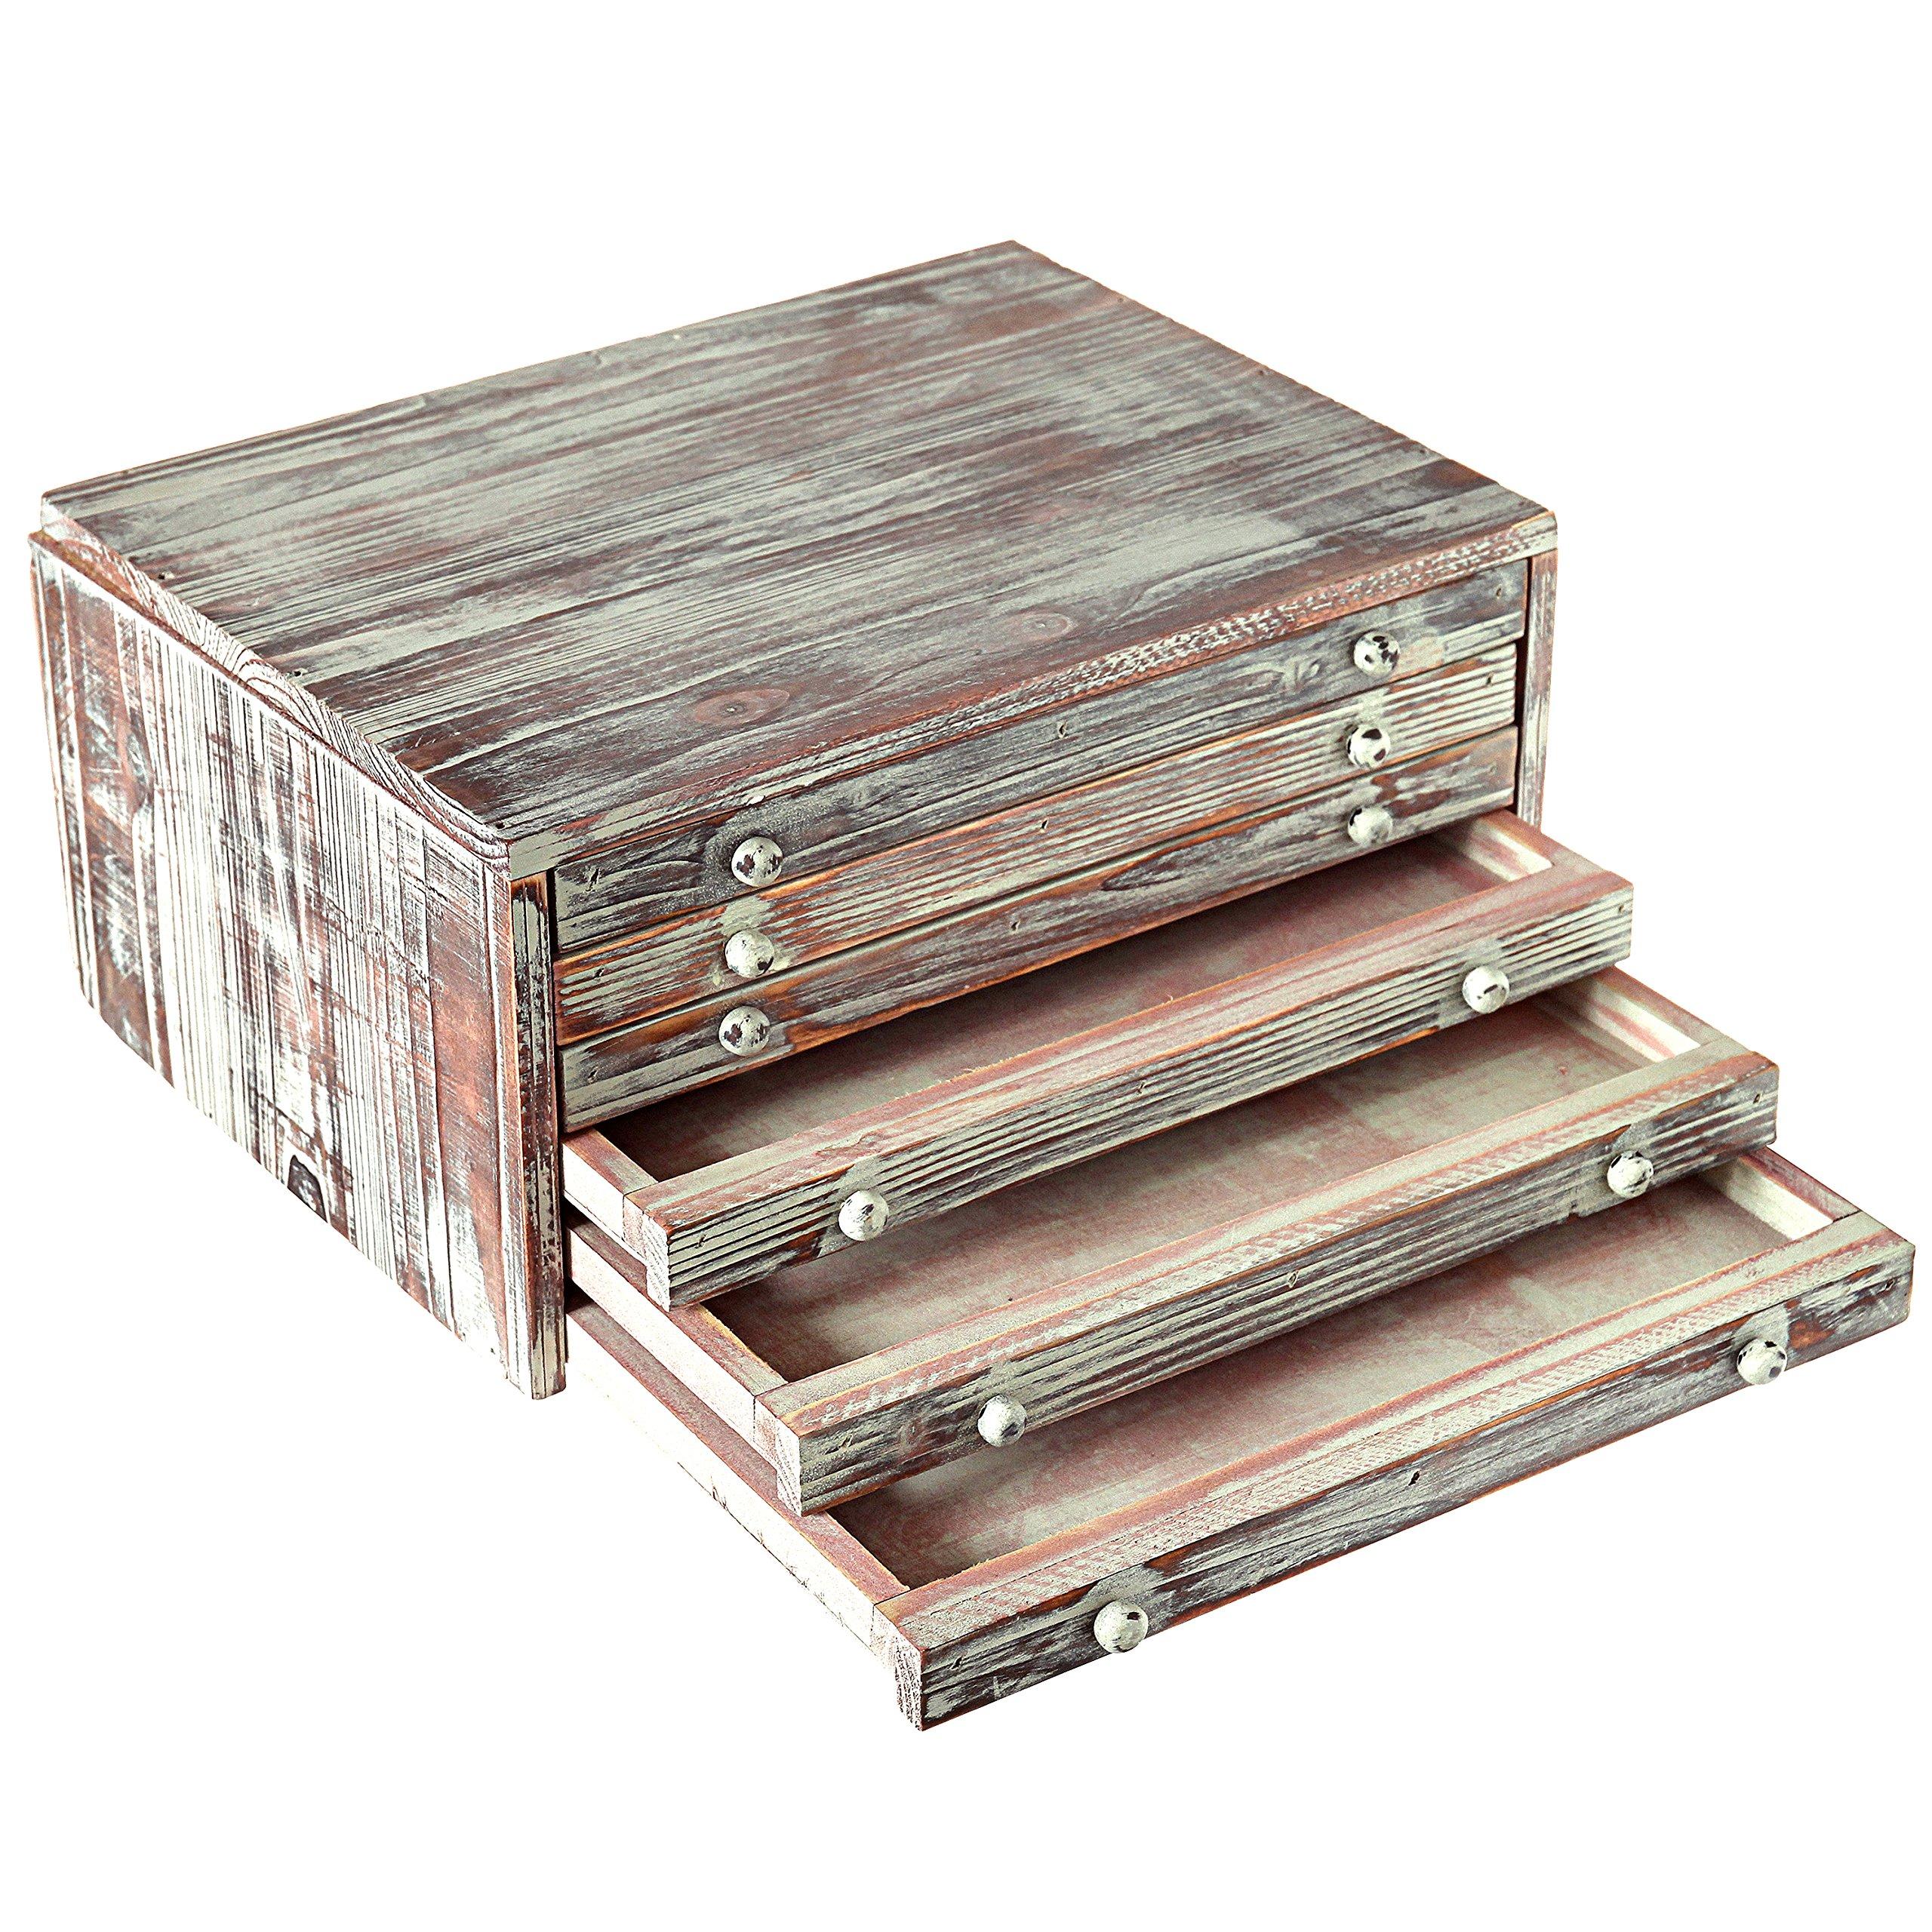 MyGift Torched Wood 6-Drawer Desktop Document & Filing Cabinet Organizer Box